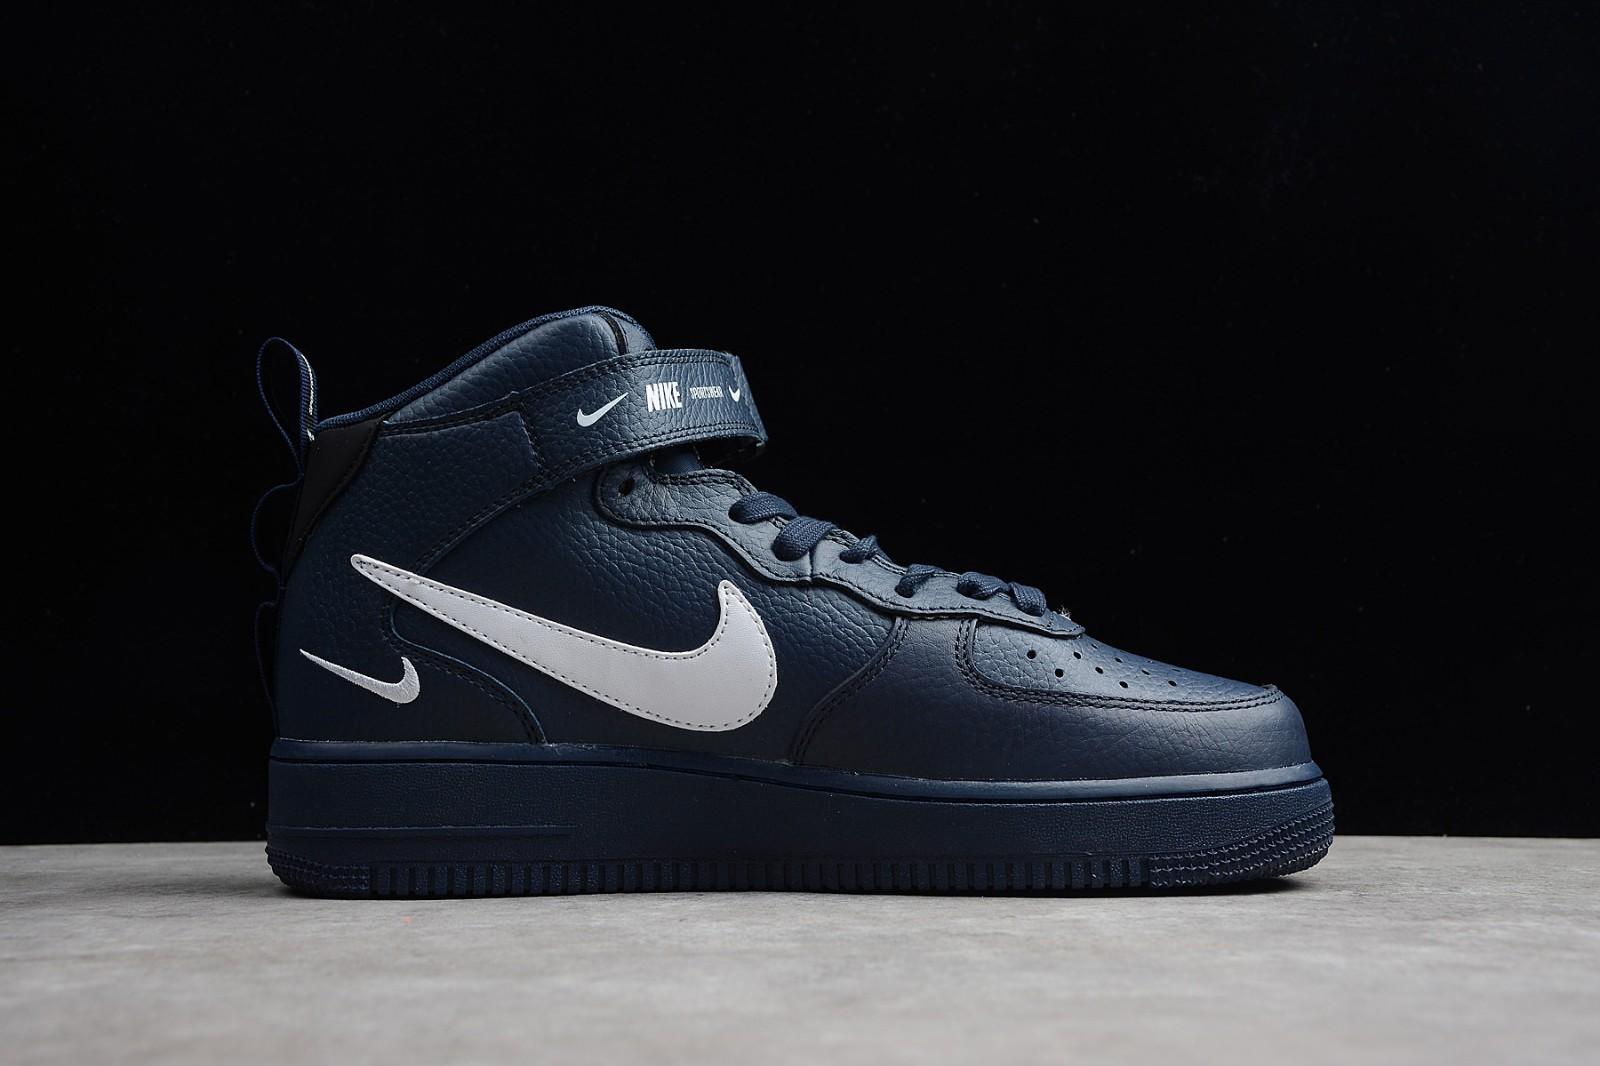 Nike Force Lv8 804609 Air 403 Obsidian 1 07 Black Mid White Tu31lKcFJ